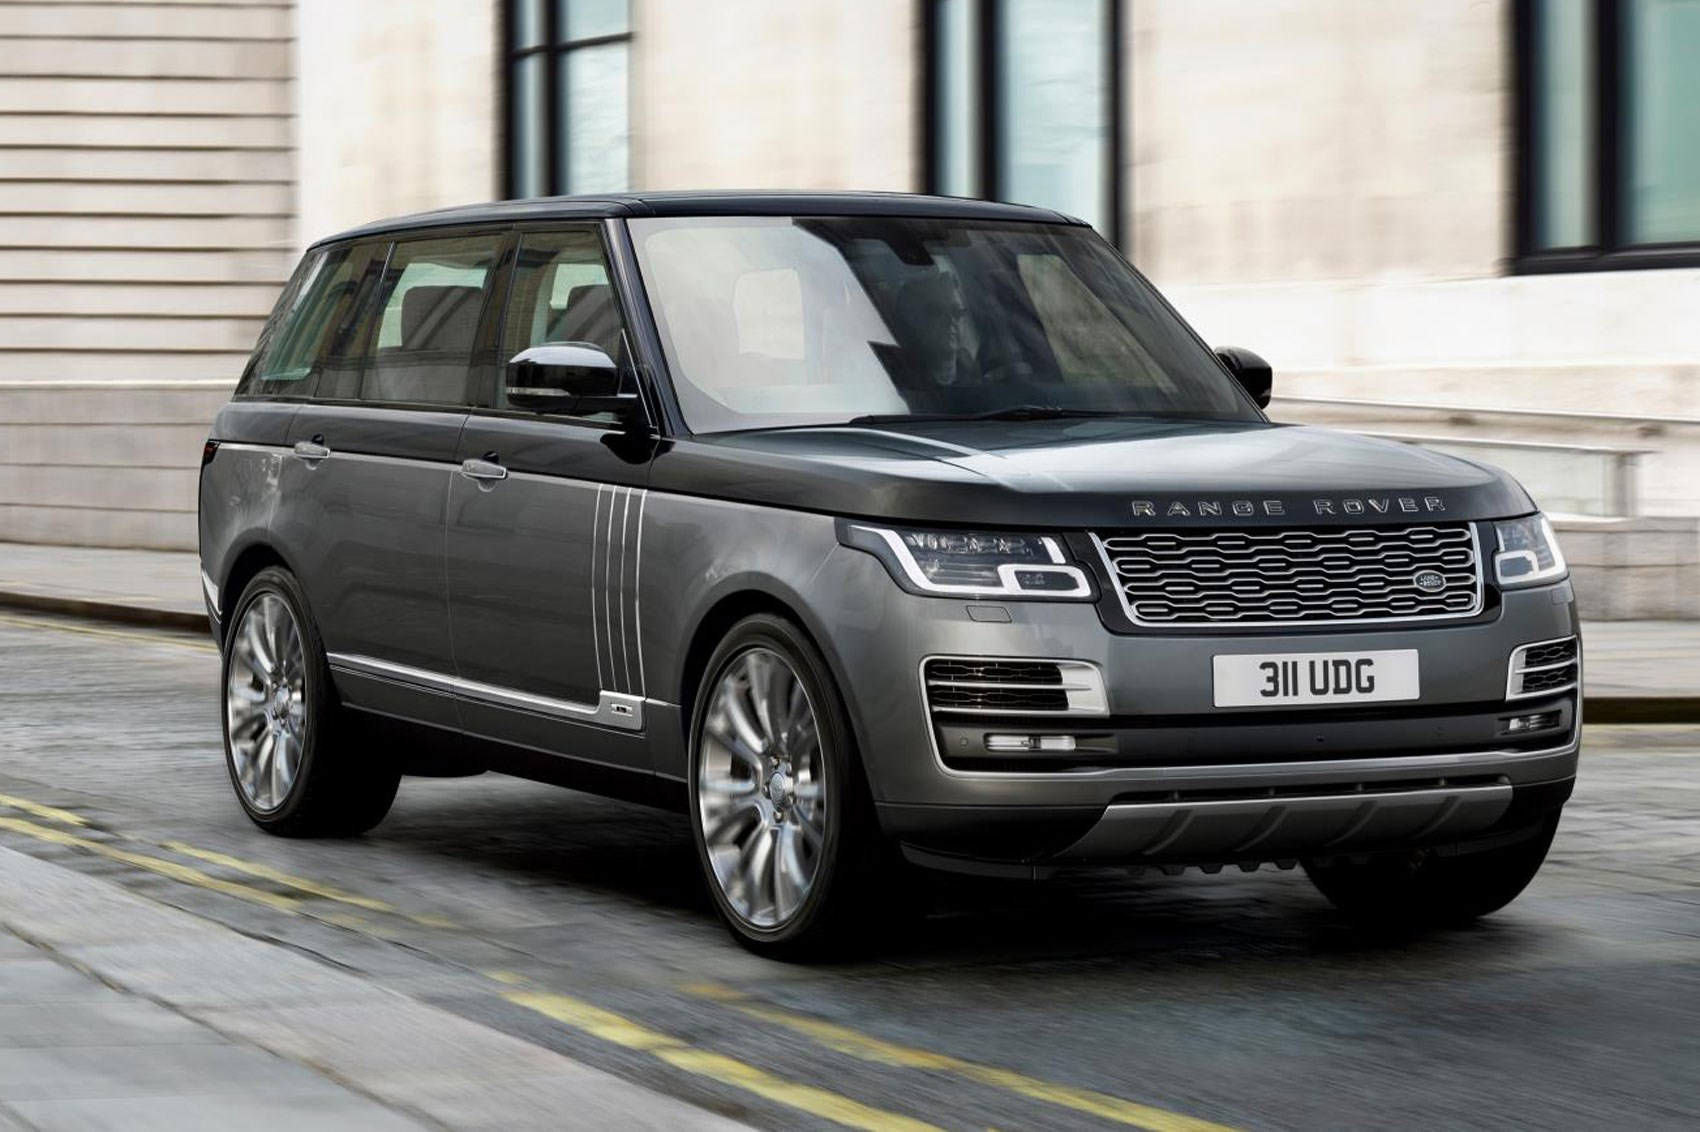 Range Rover Svautobiography Revealed At 2018 La Motor Show